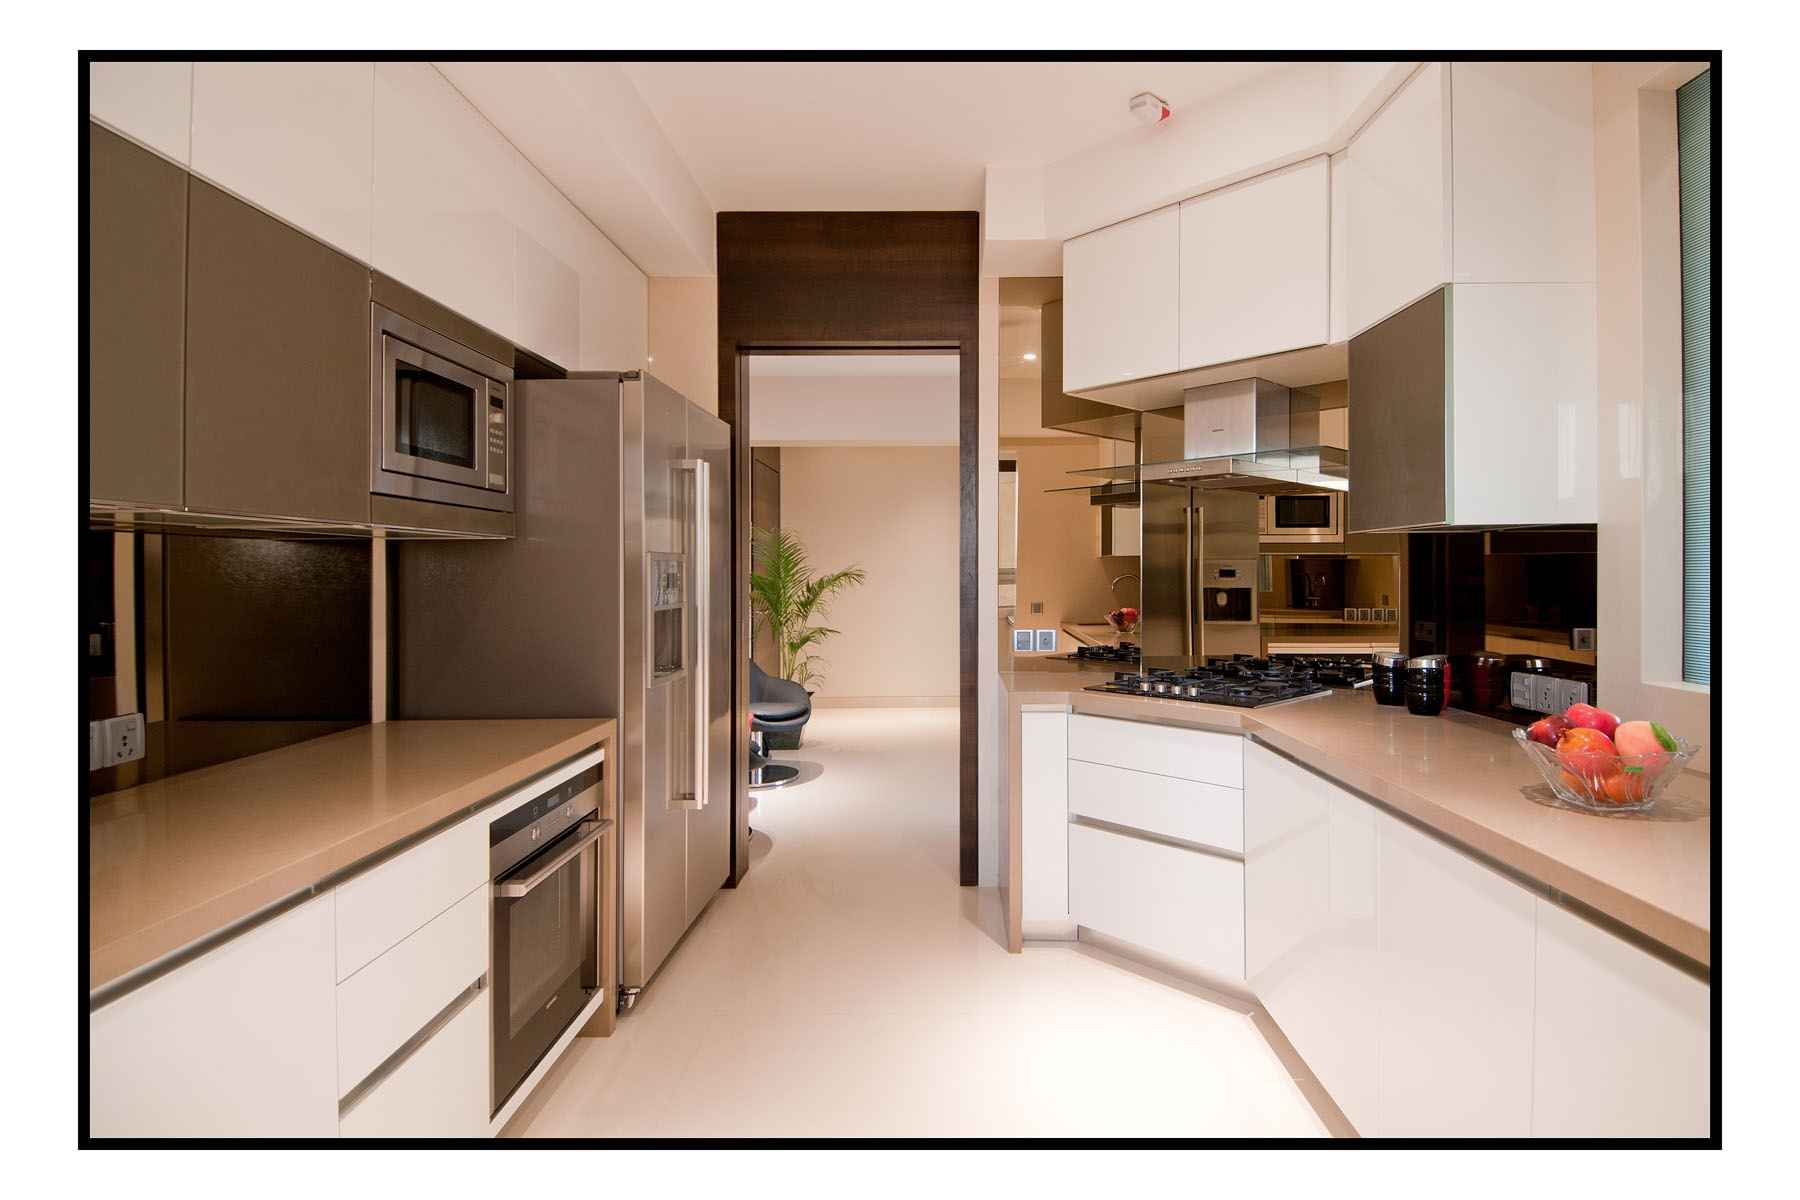 Charmant Cool Kitchen Design By Sameer Panchal, Architect In Mumbai, Maharashtra,  India